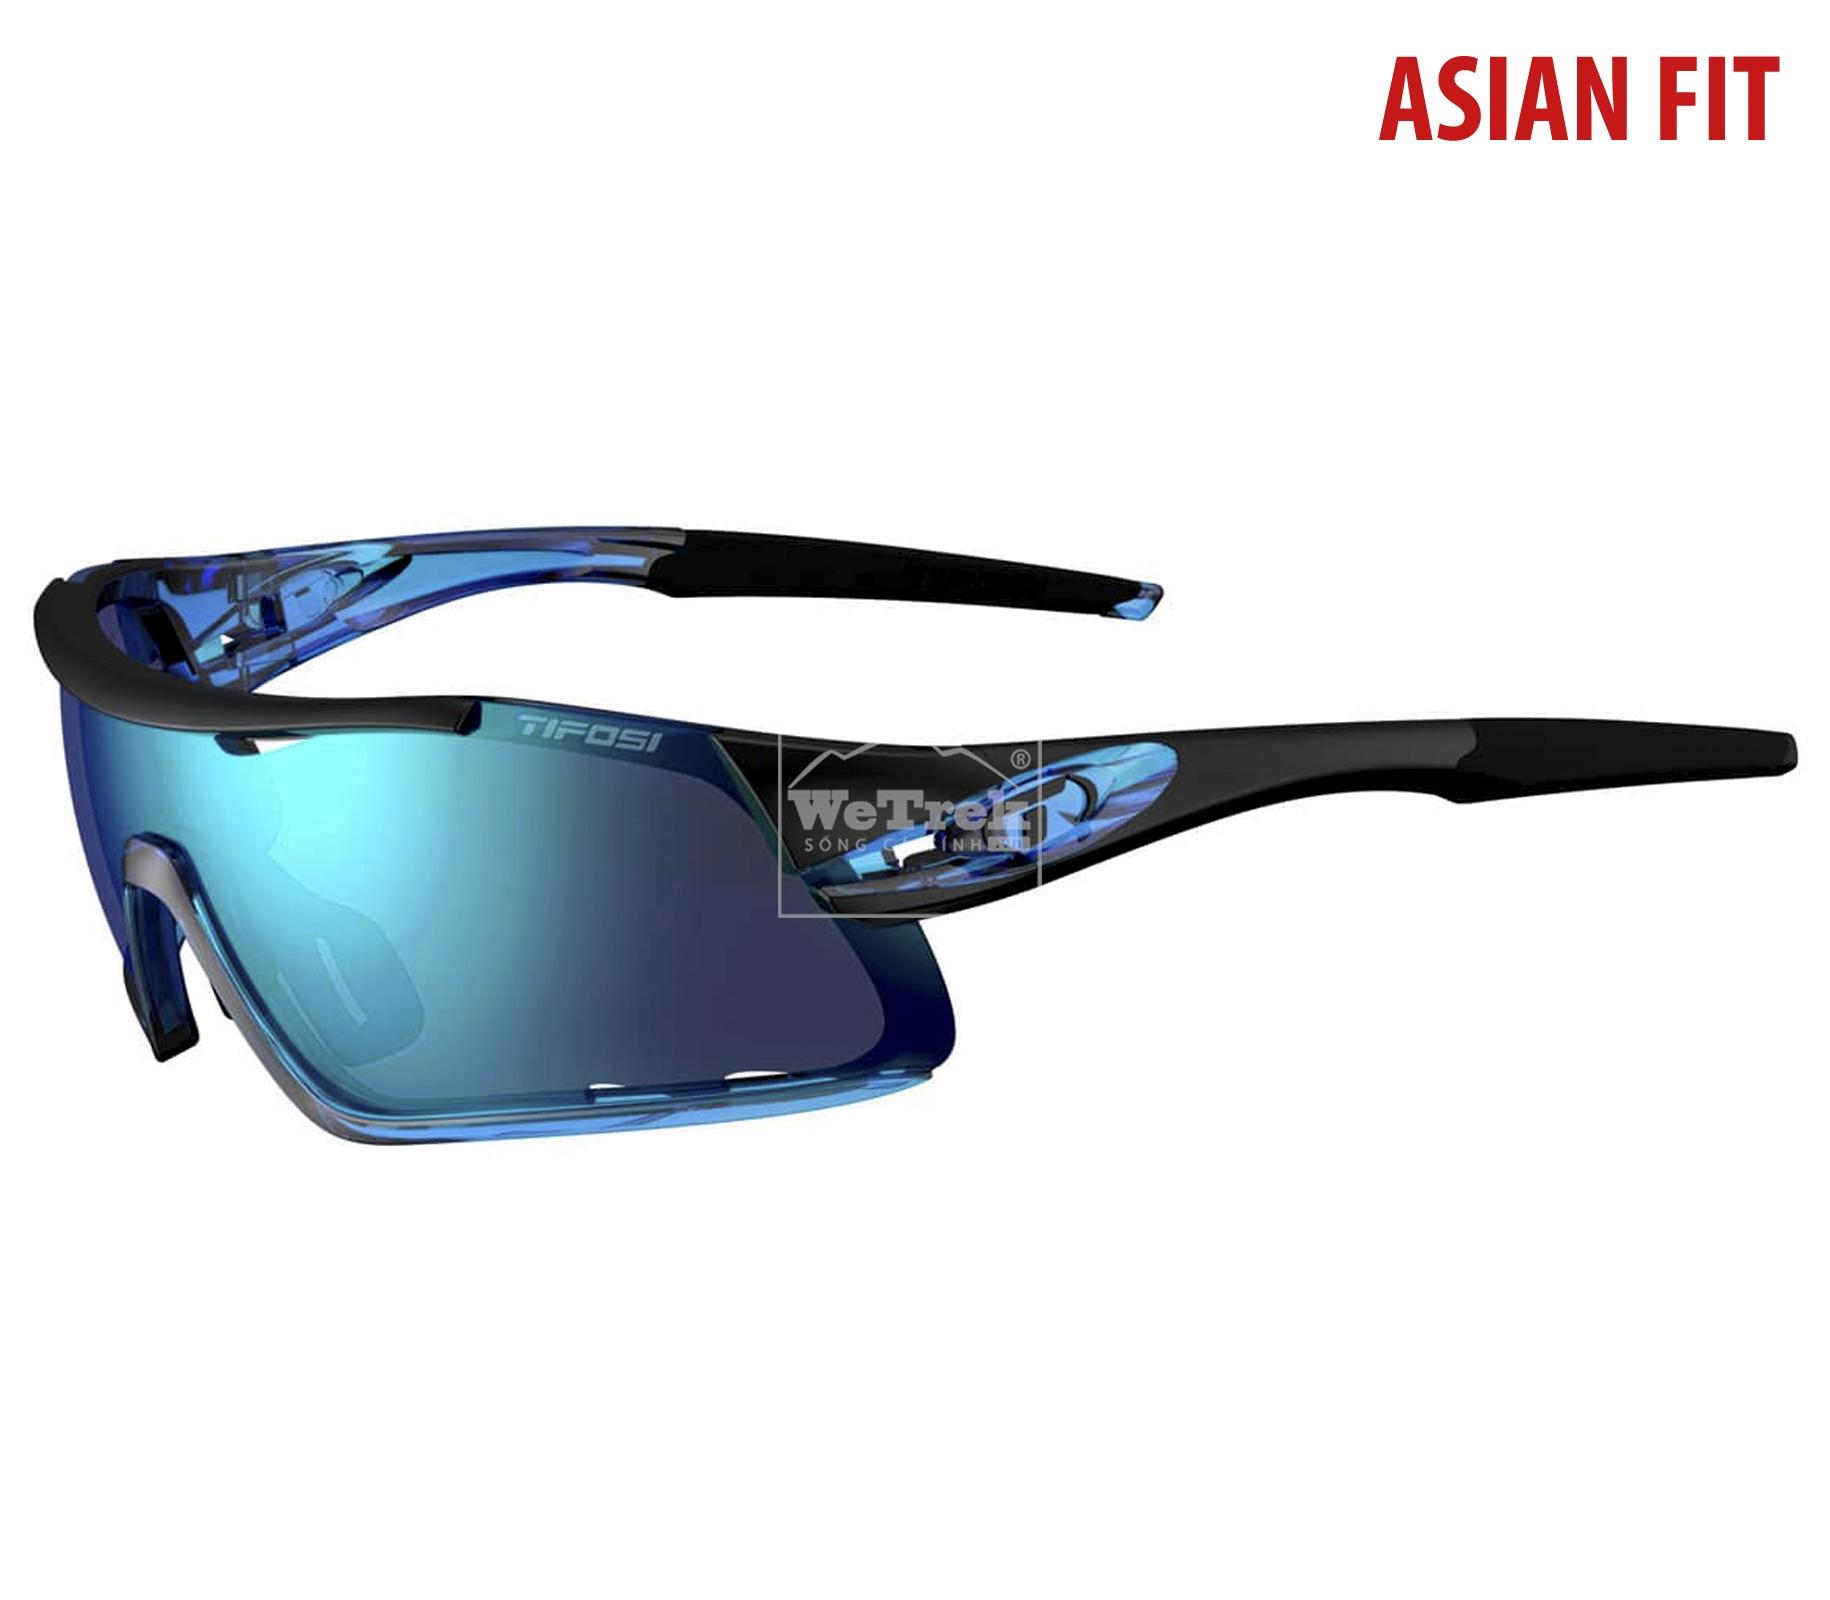 Kính thể thao TIFOSI Davos Crystal Blue - 8986